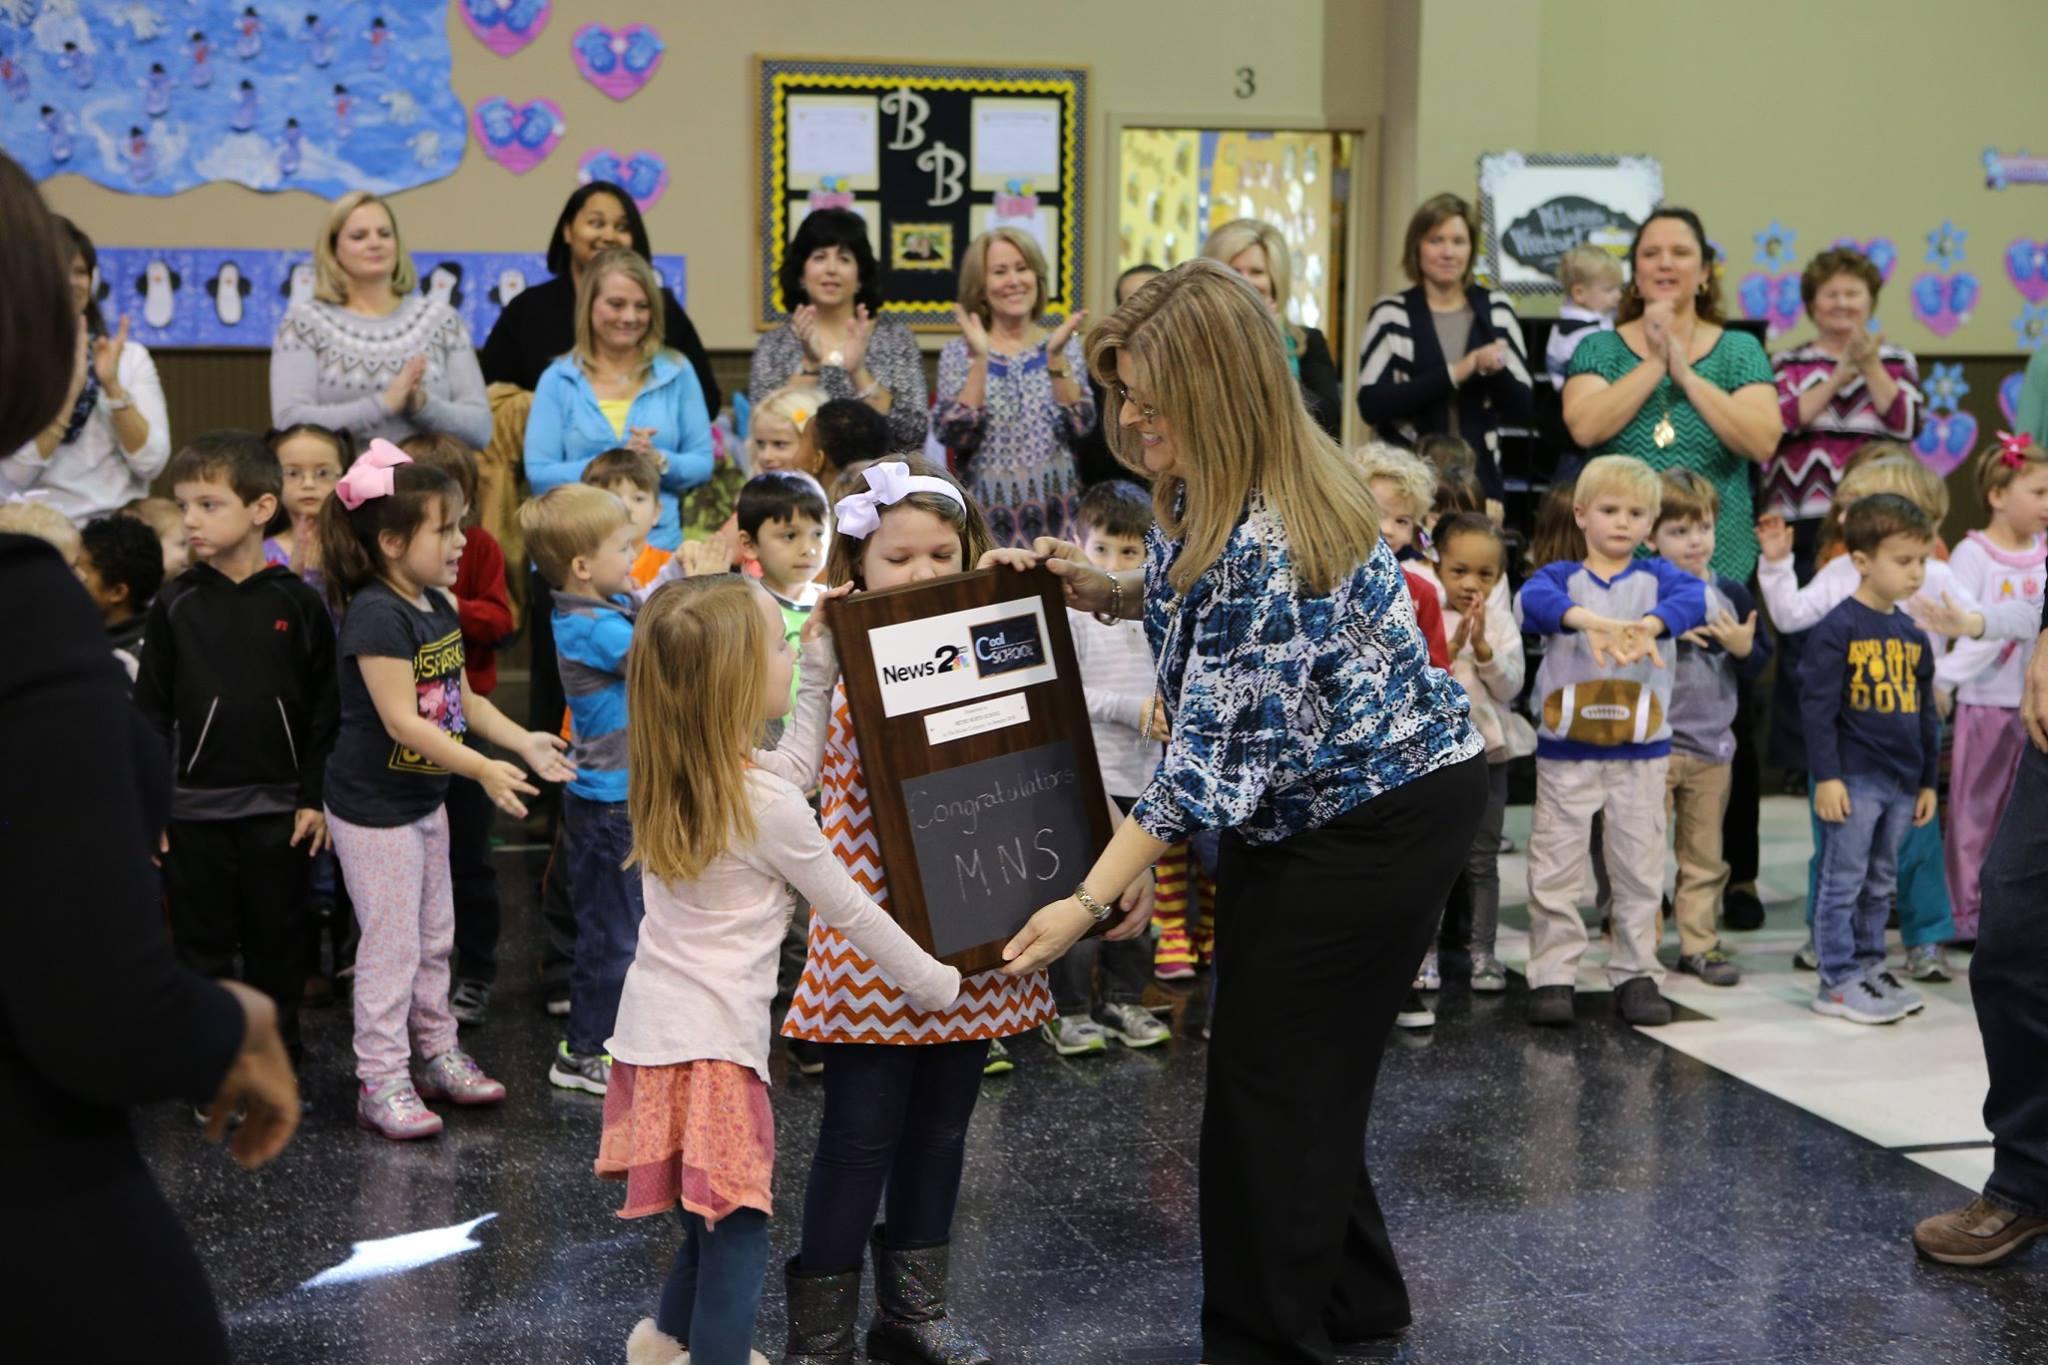 COOL SCHOOL Award: January 2016